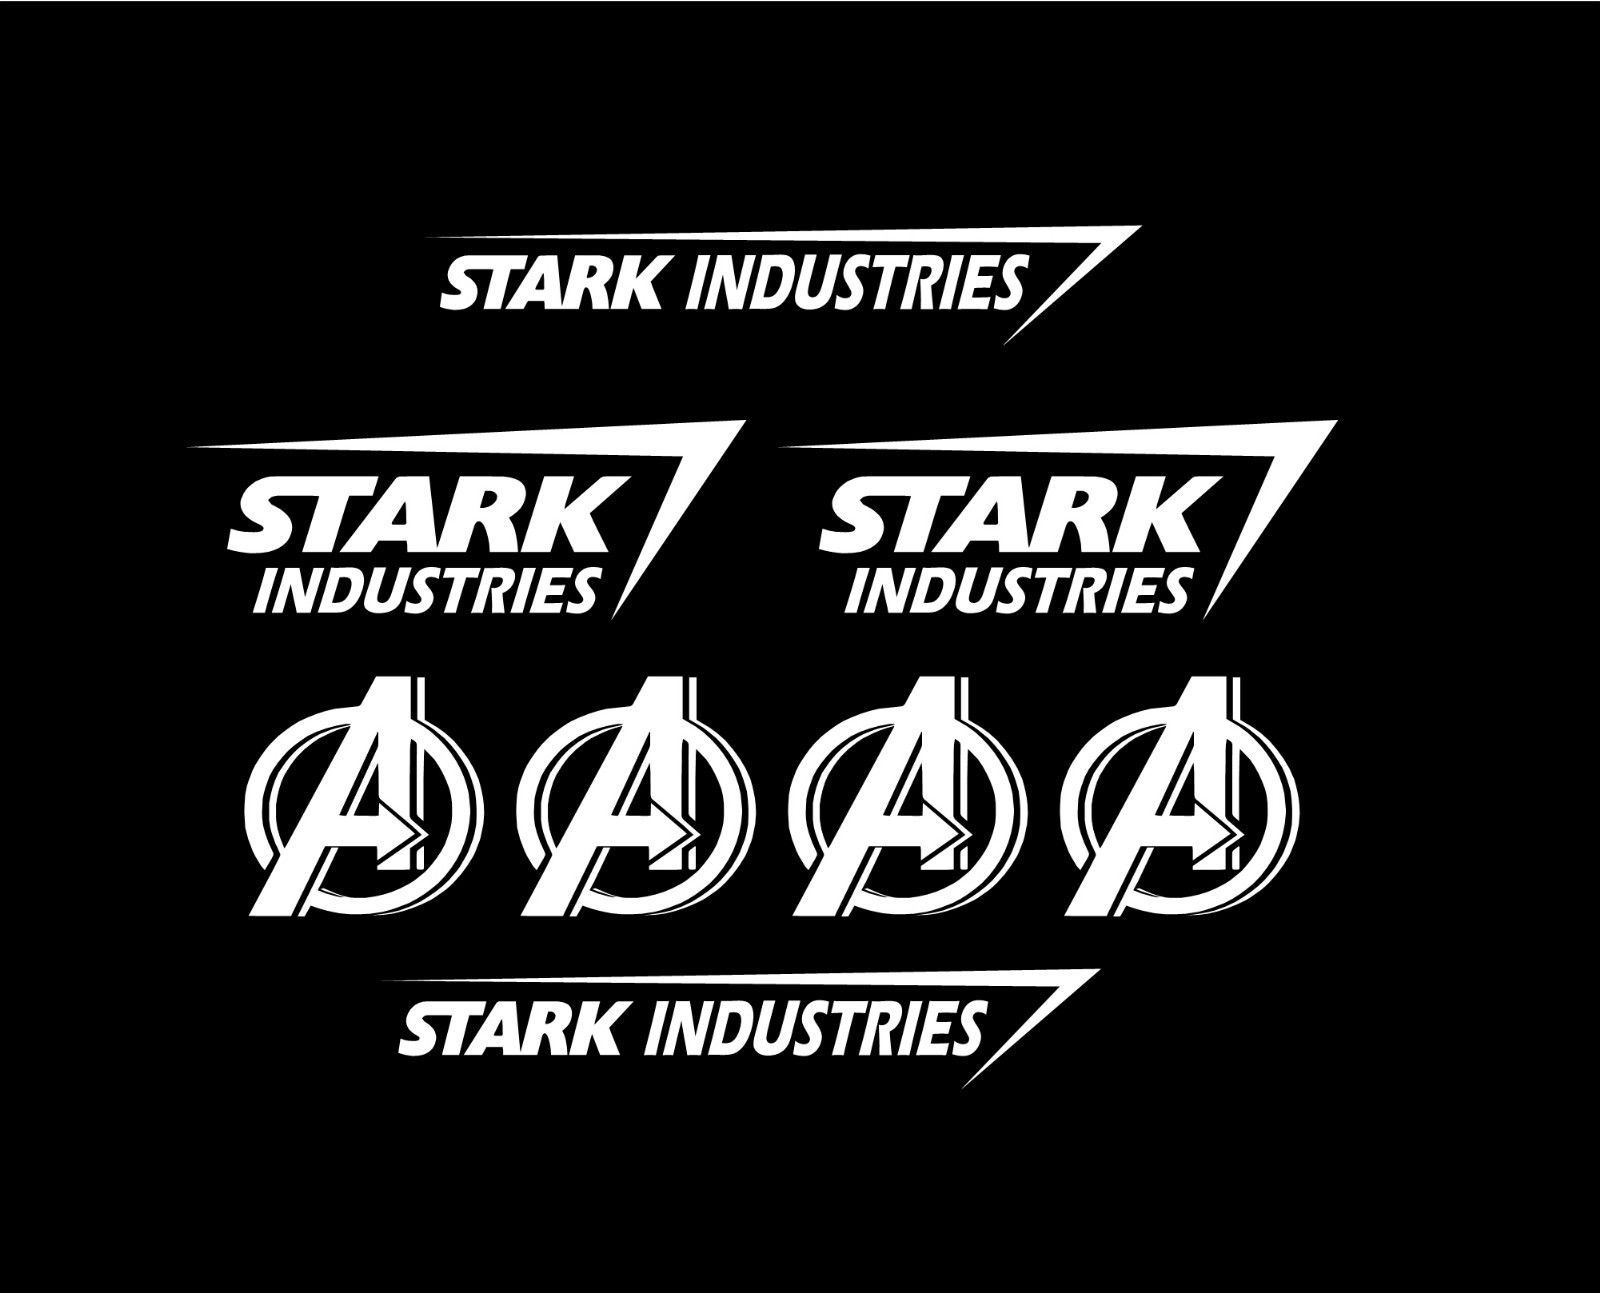 Set Of 8 Stark Industries Iron Man Avengers Marvel Vinyl Car Decal Sticker Ebay In 2021 Stark Industries Car Decals Vinyl Iron Man [ 1293 x 1600 Pixel ]